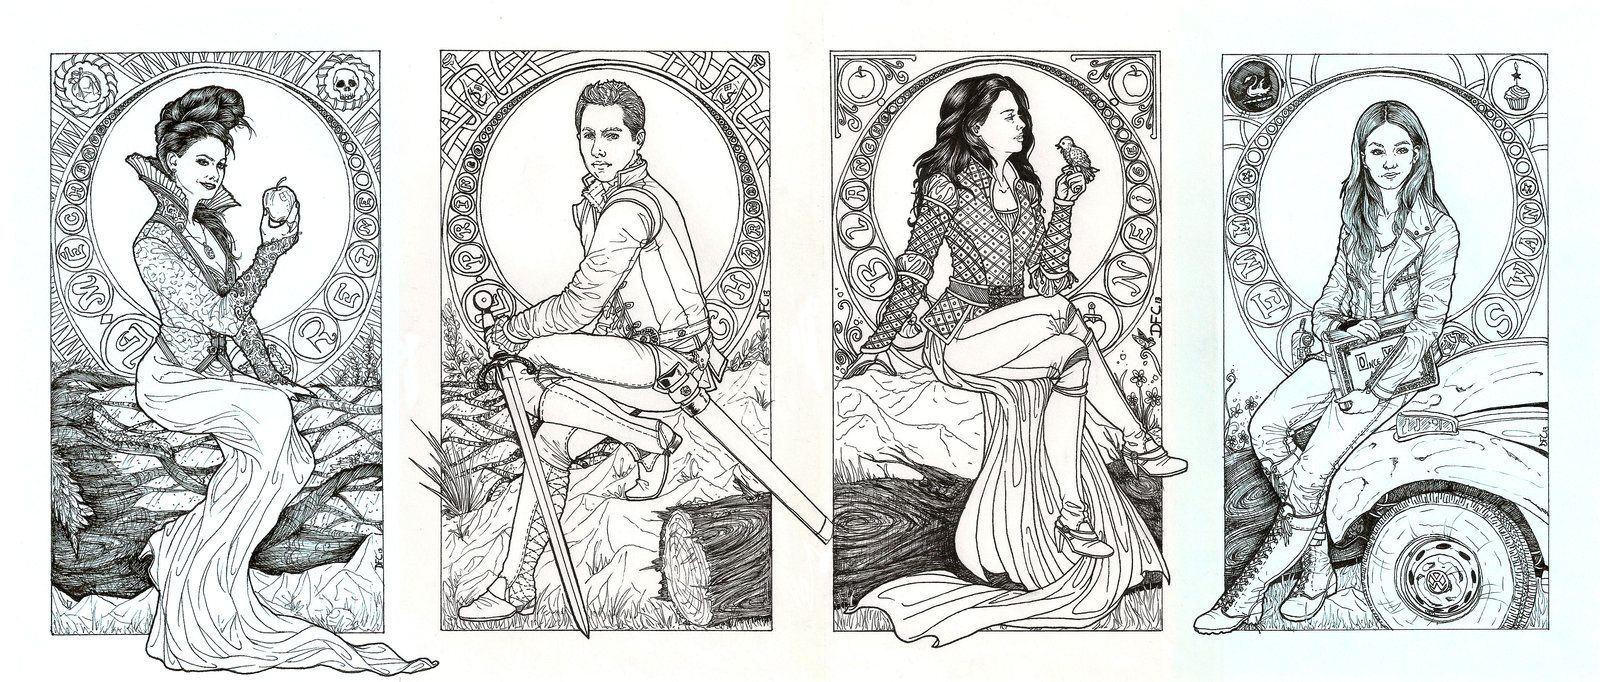 Ouat Queen Warrior Princess And Saviour By Danielfoez